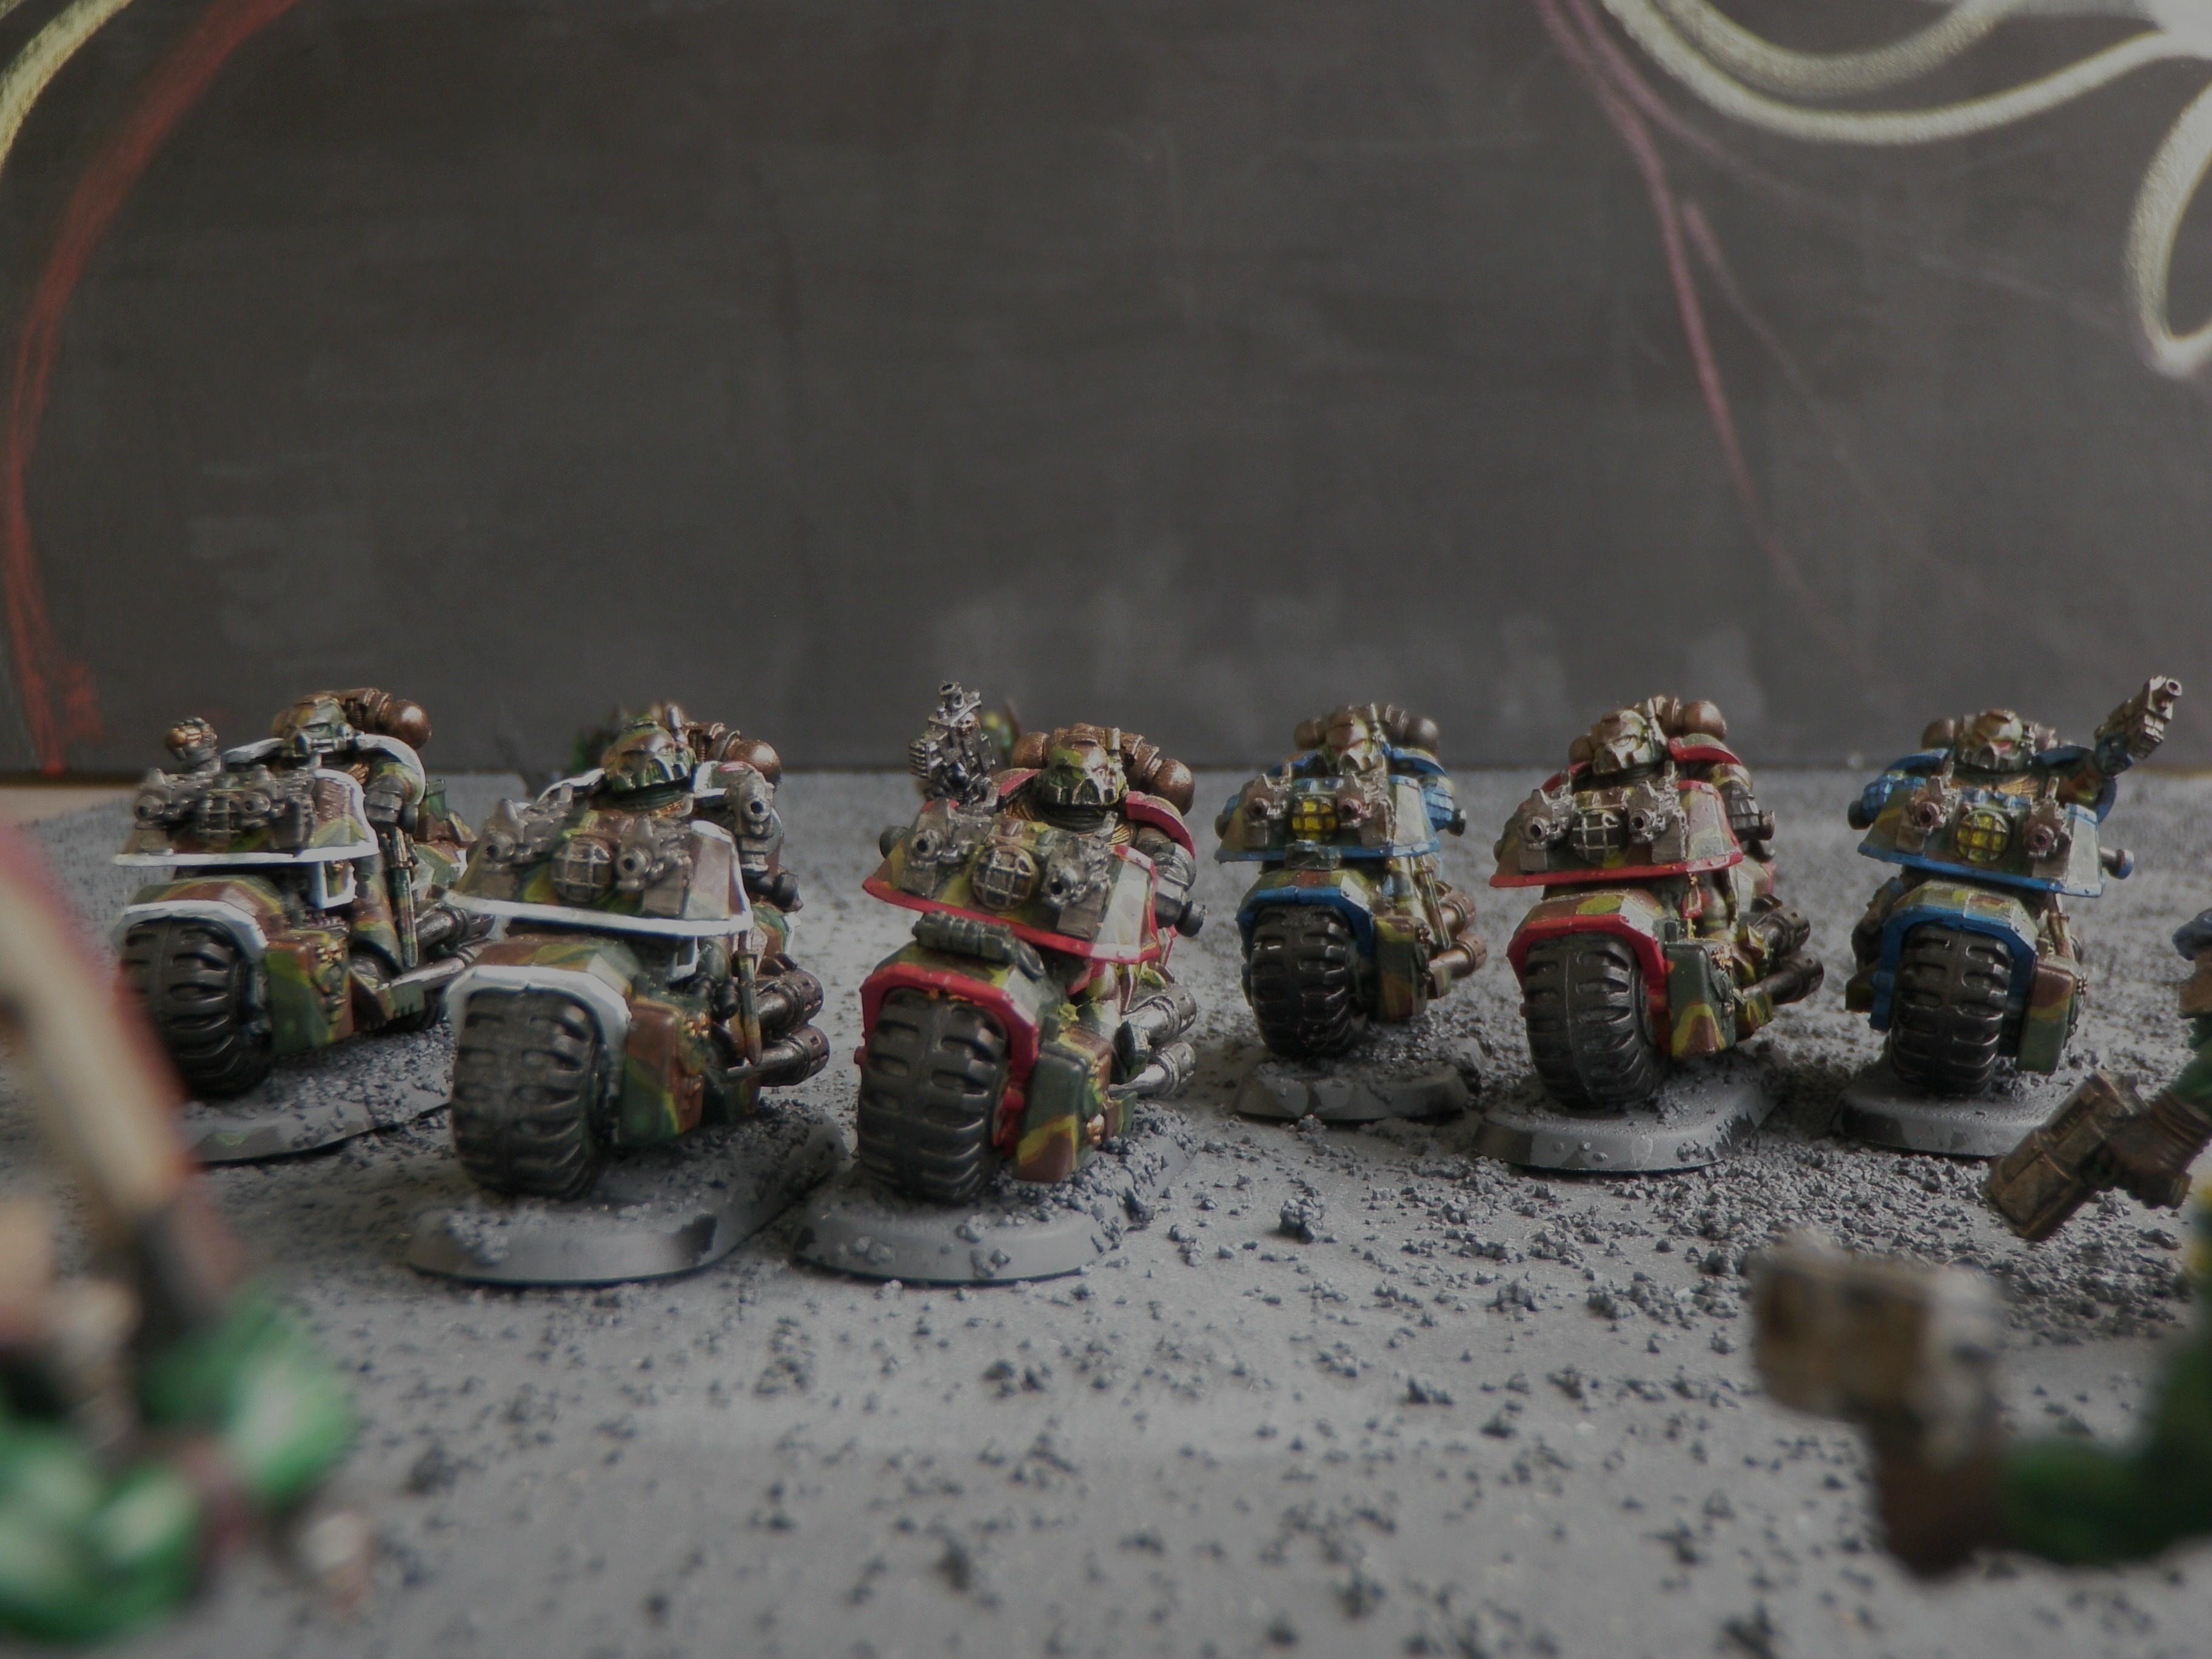 Bike, Bolt Pistols, Camouflage, Space Marines